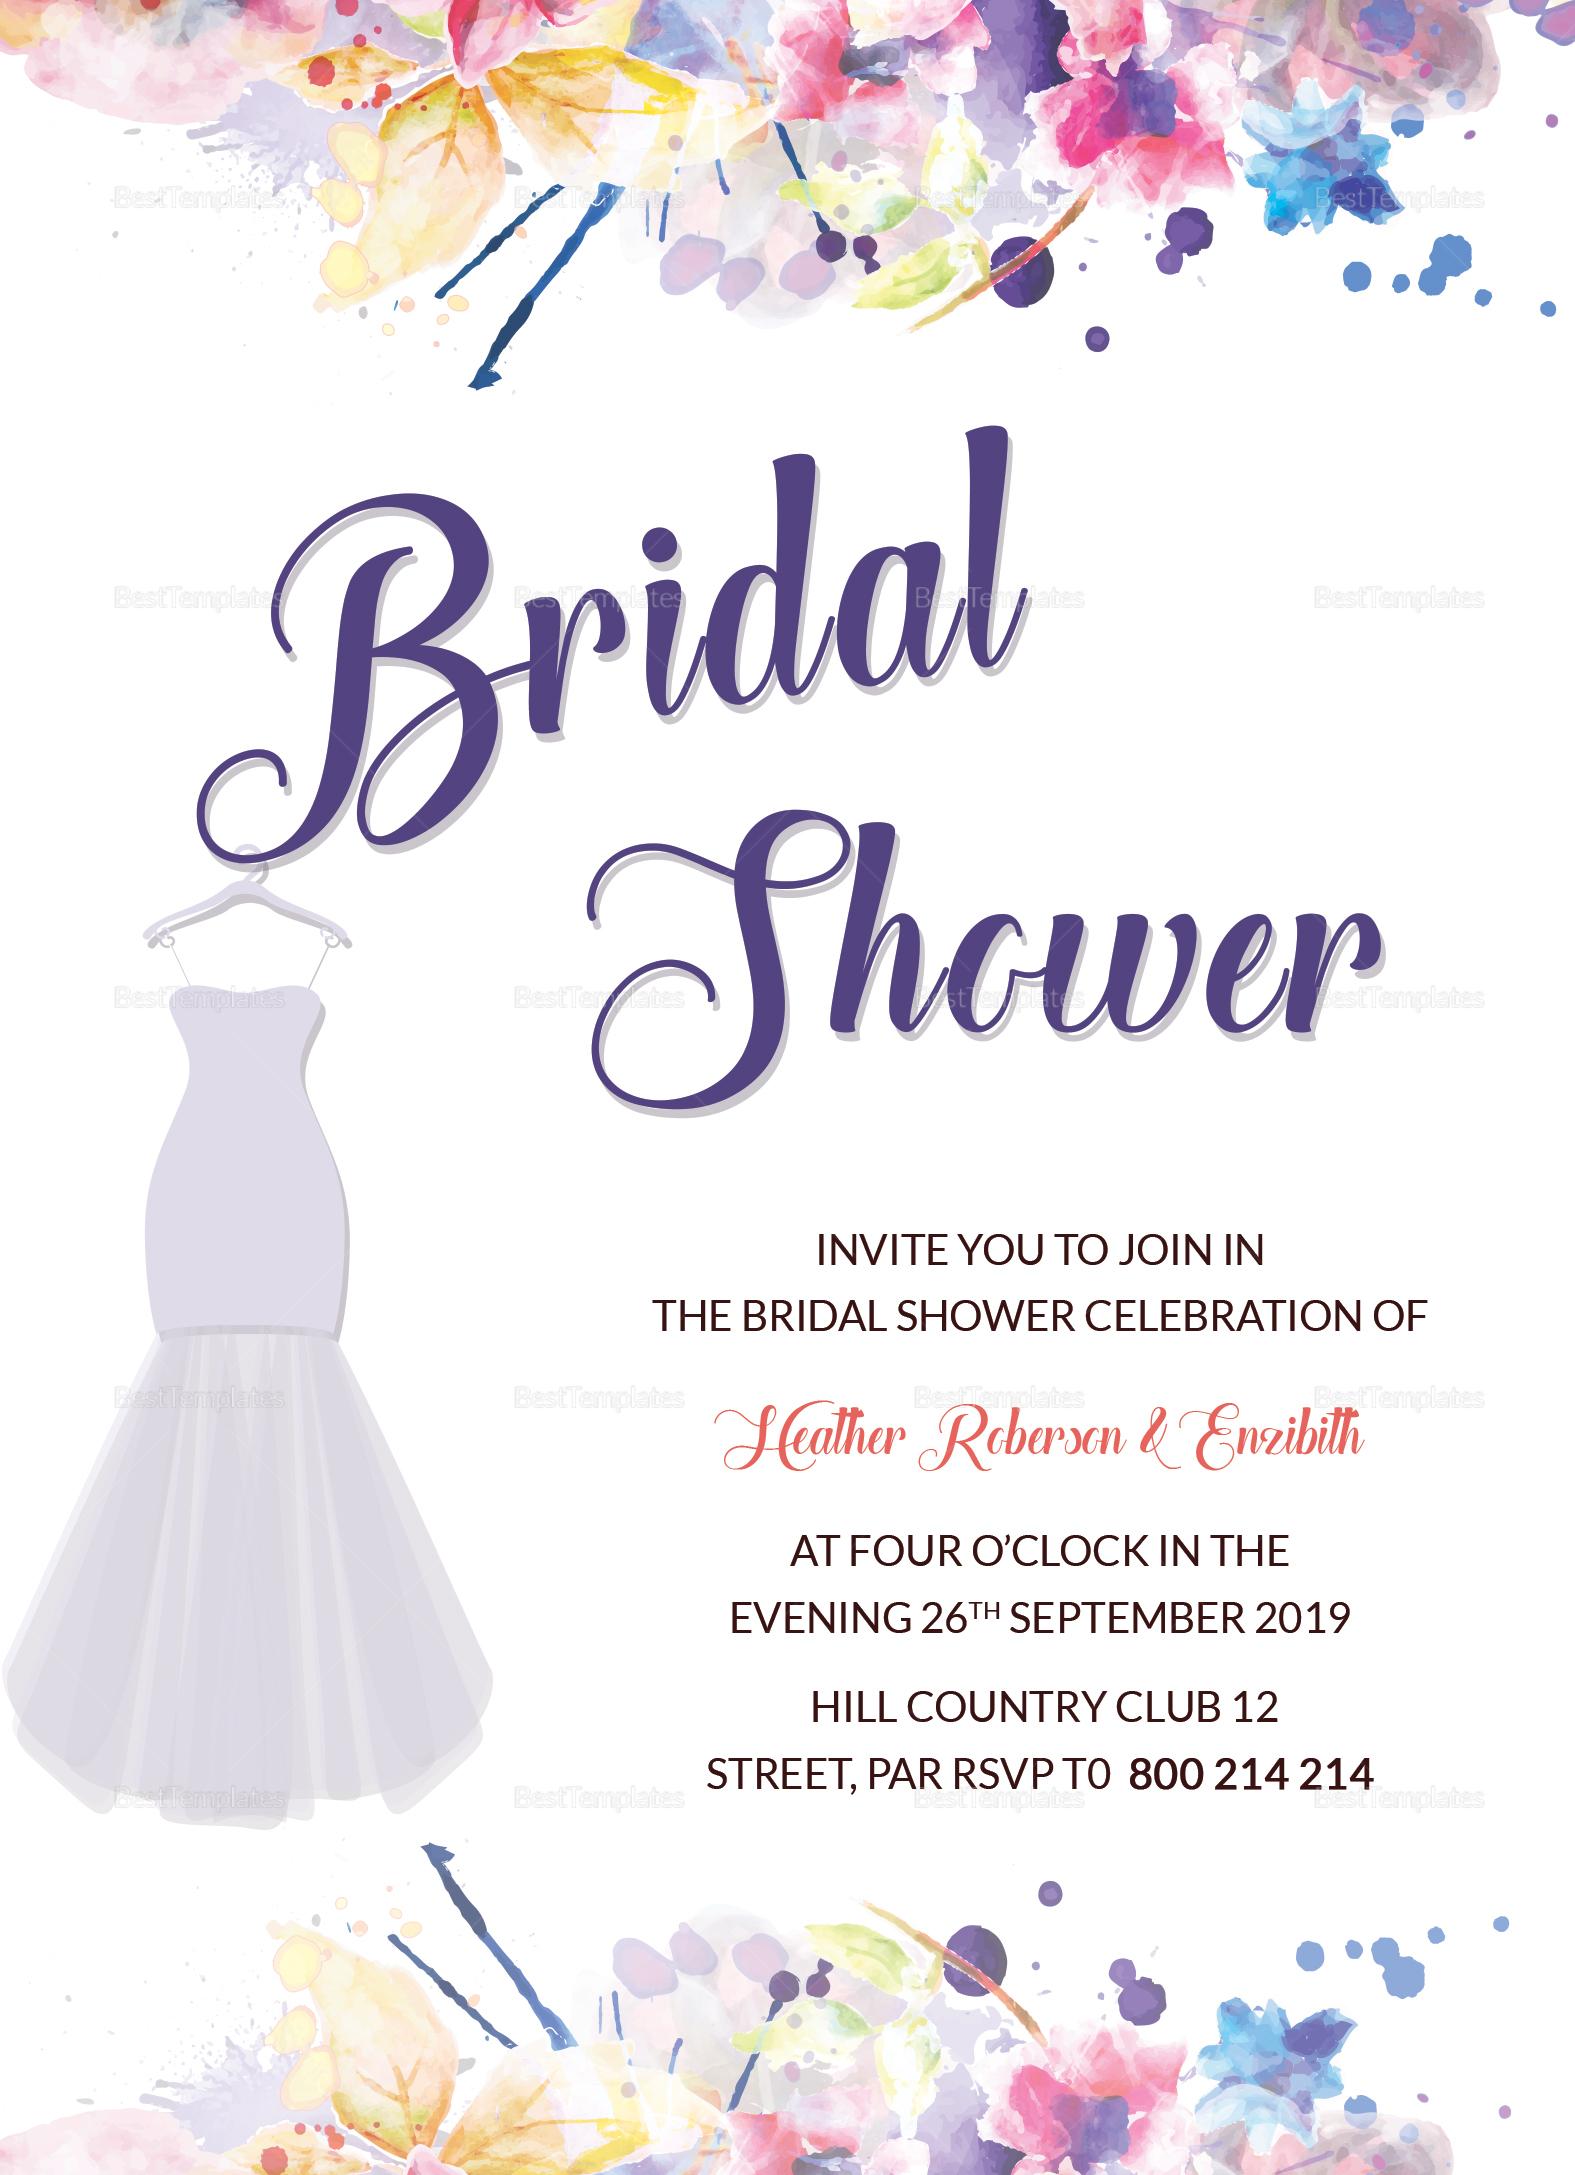 Autumn Bridal Shower Invitation Design Template